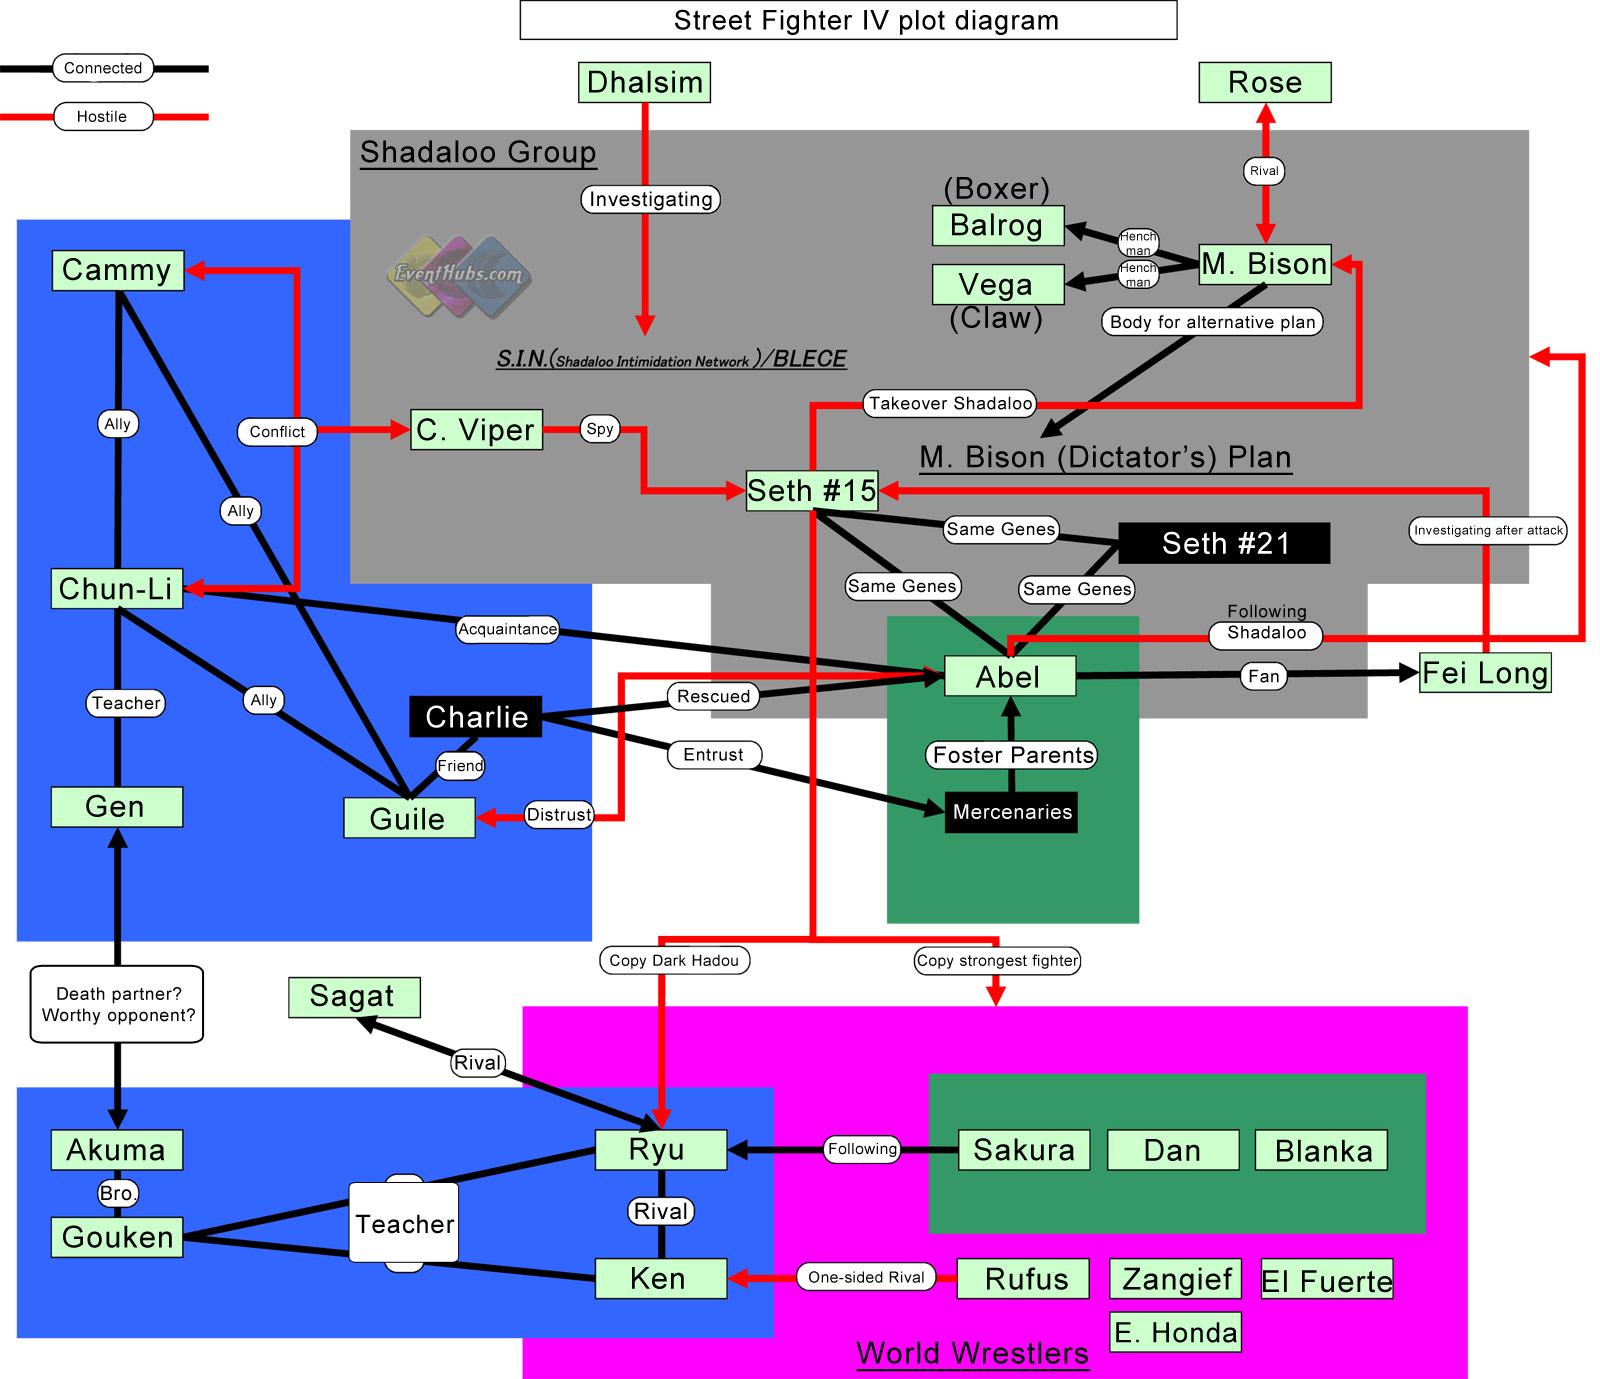 Street Fighter 4 plot chart diagram